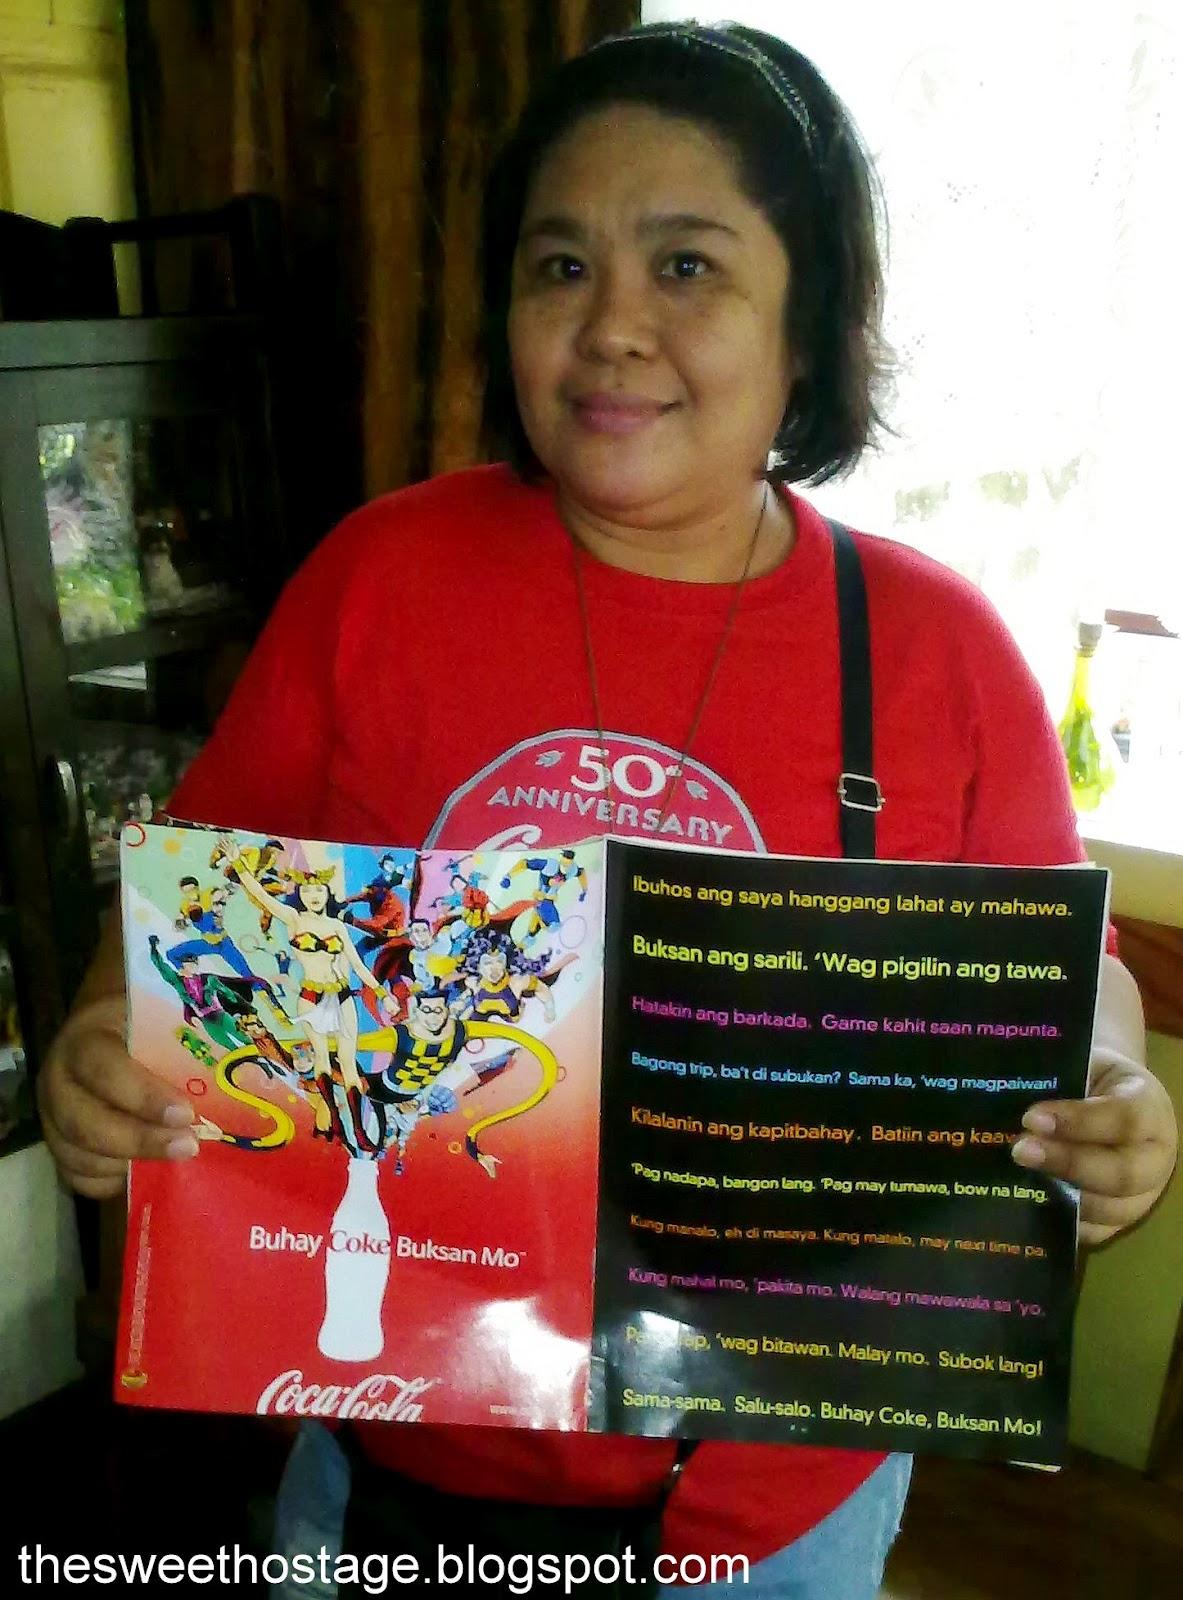 Ang Kapitbahay 2003 Tagalog Movie sweet hostage: coke ad: pinoy super heroes